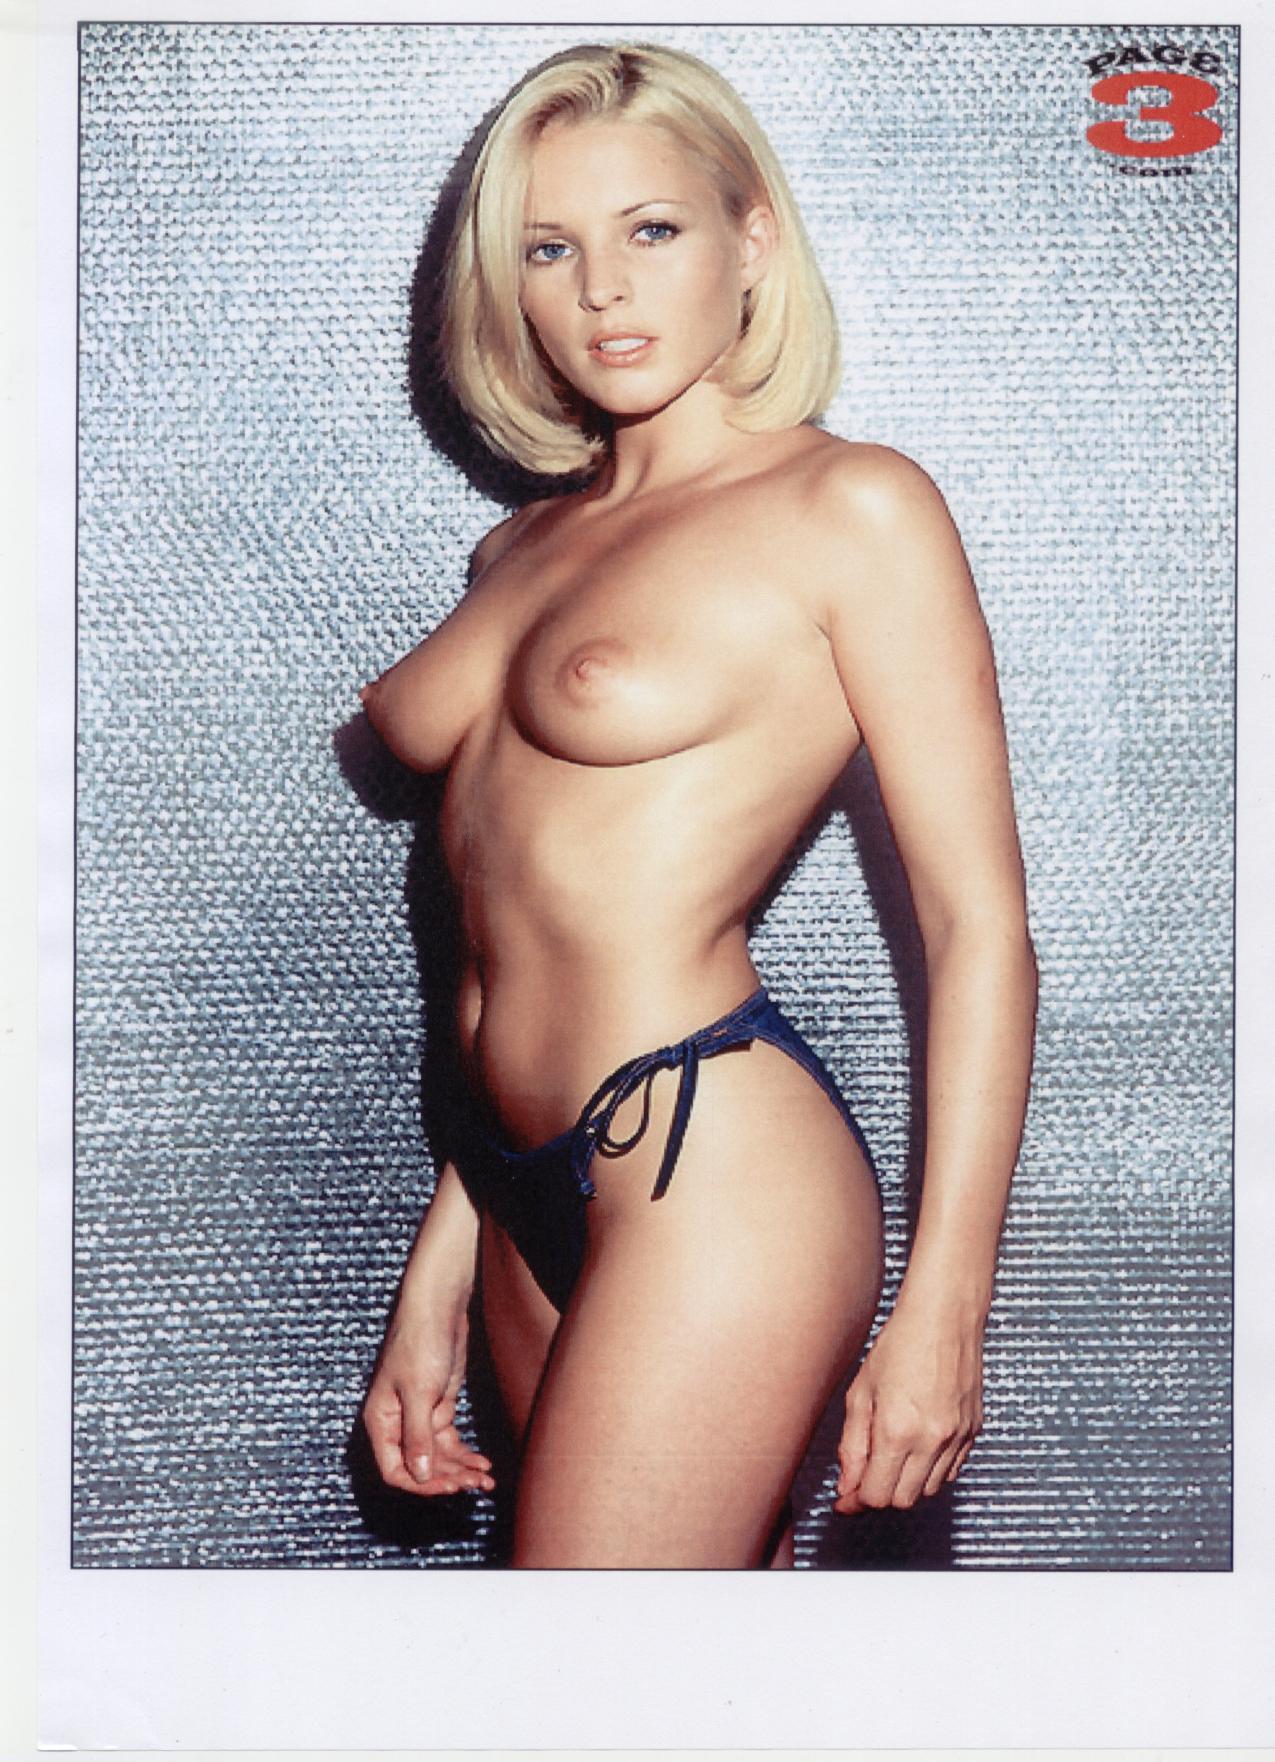 Blonde hair girls naked XXX